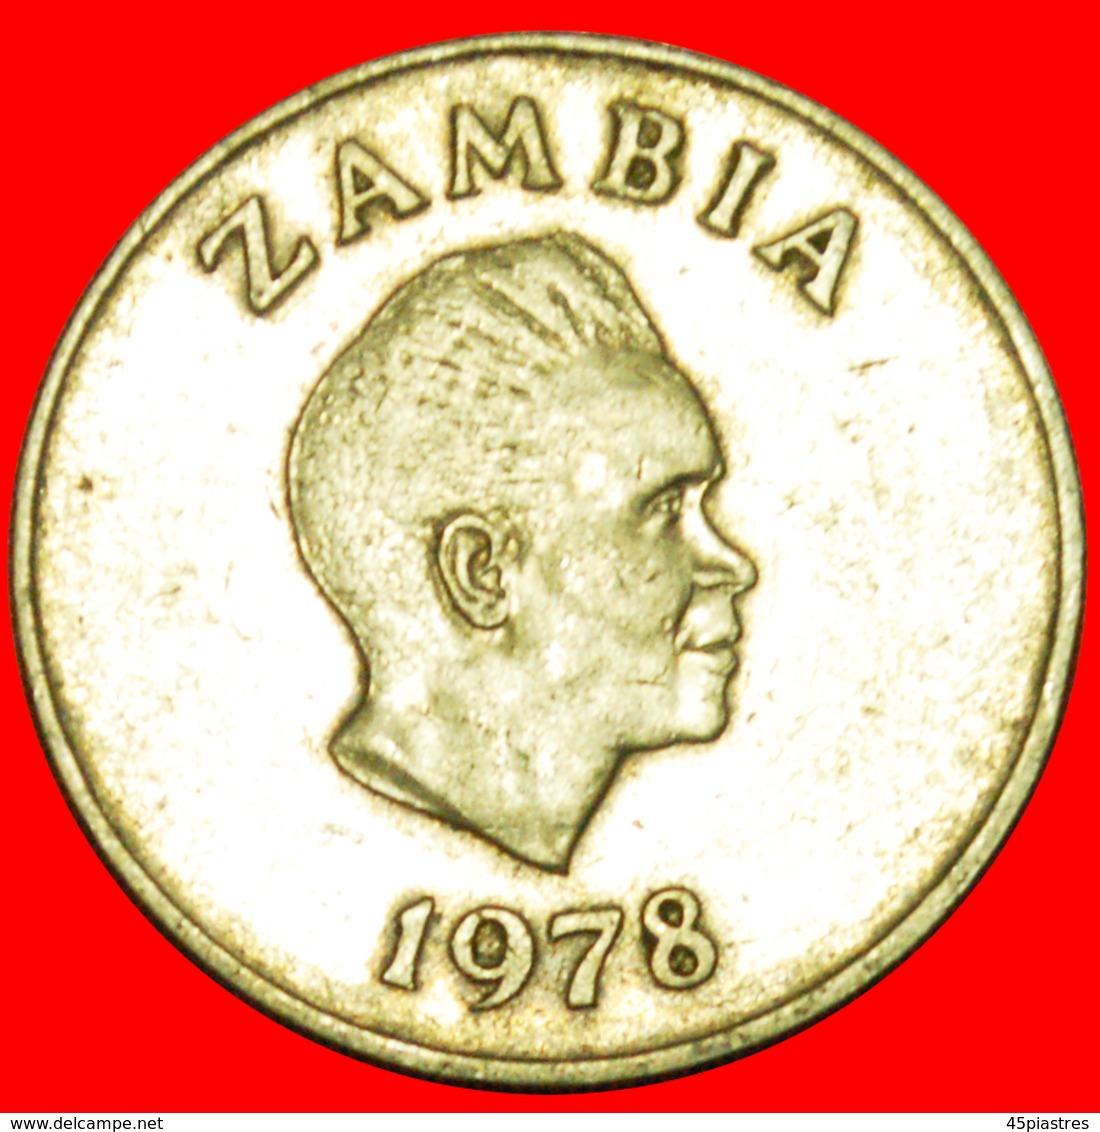 + GREAT BRITAIN: ZAMBIA ★ 10 NGWEE 1978! LOW START ★ NO RESERVE! - Zambia